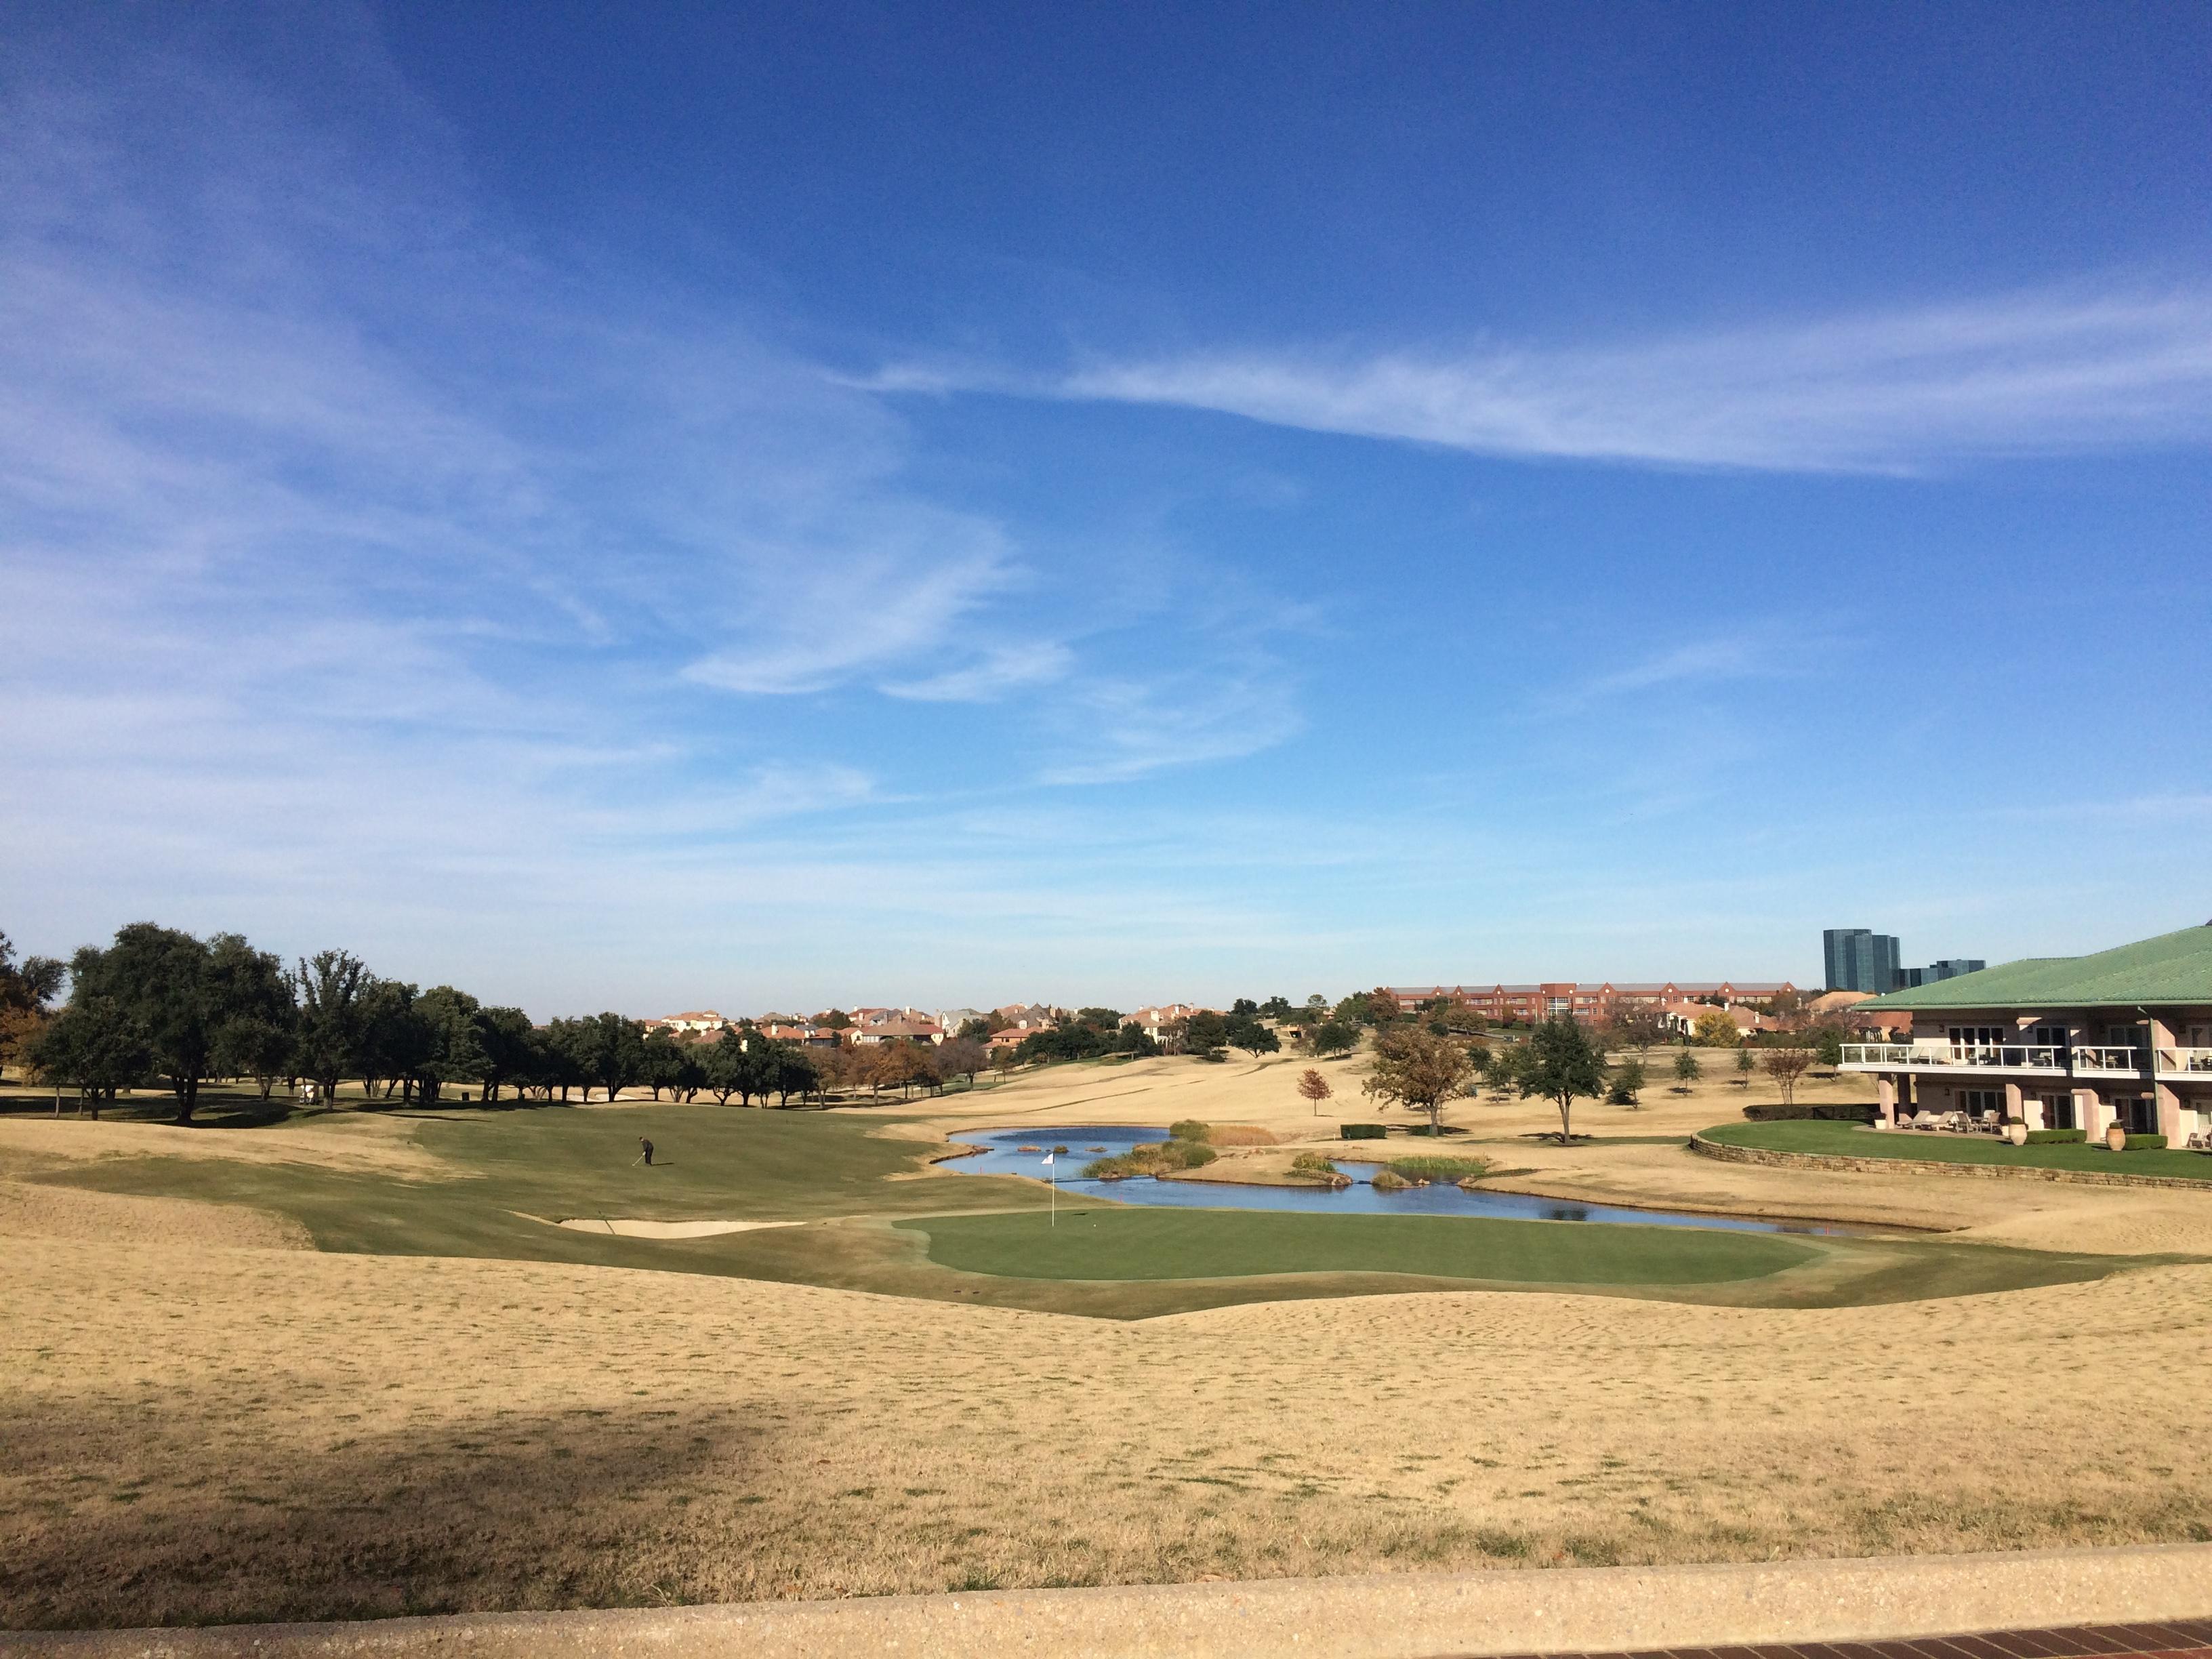 Hotel Review: Four Seasons Resort & Club Dallas at Las Colinas